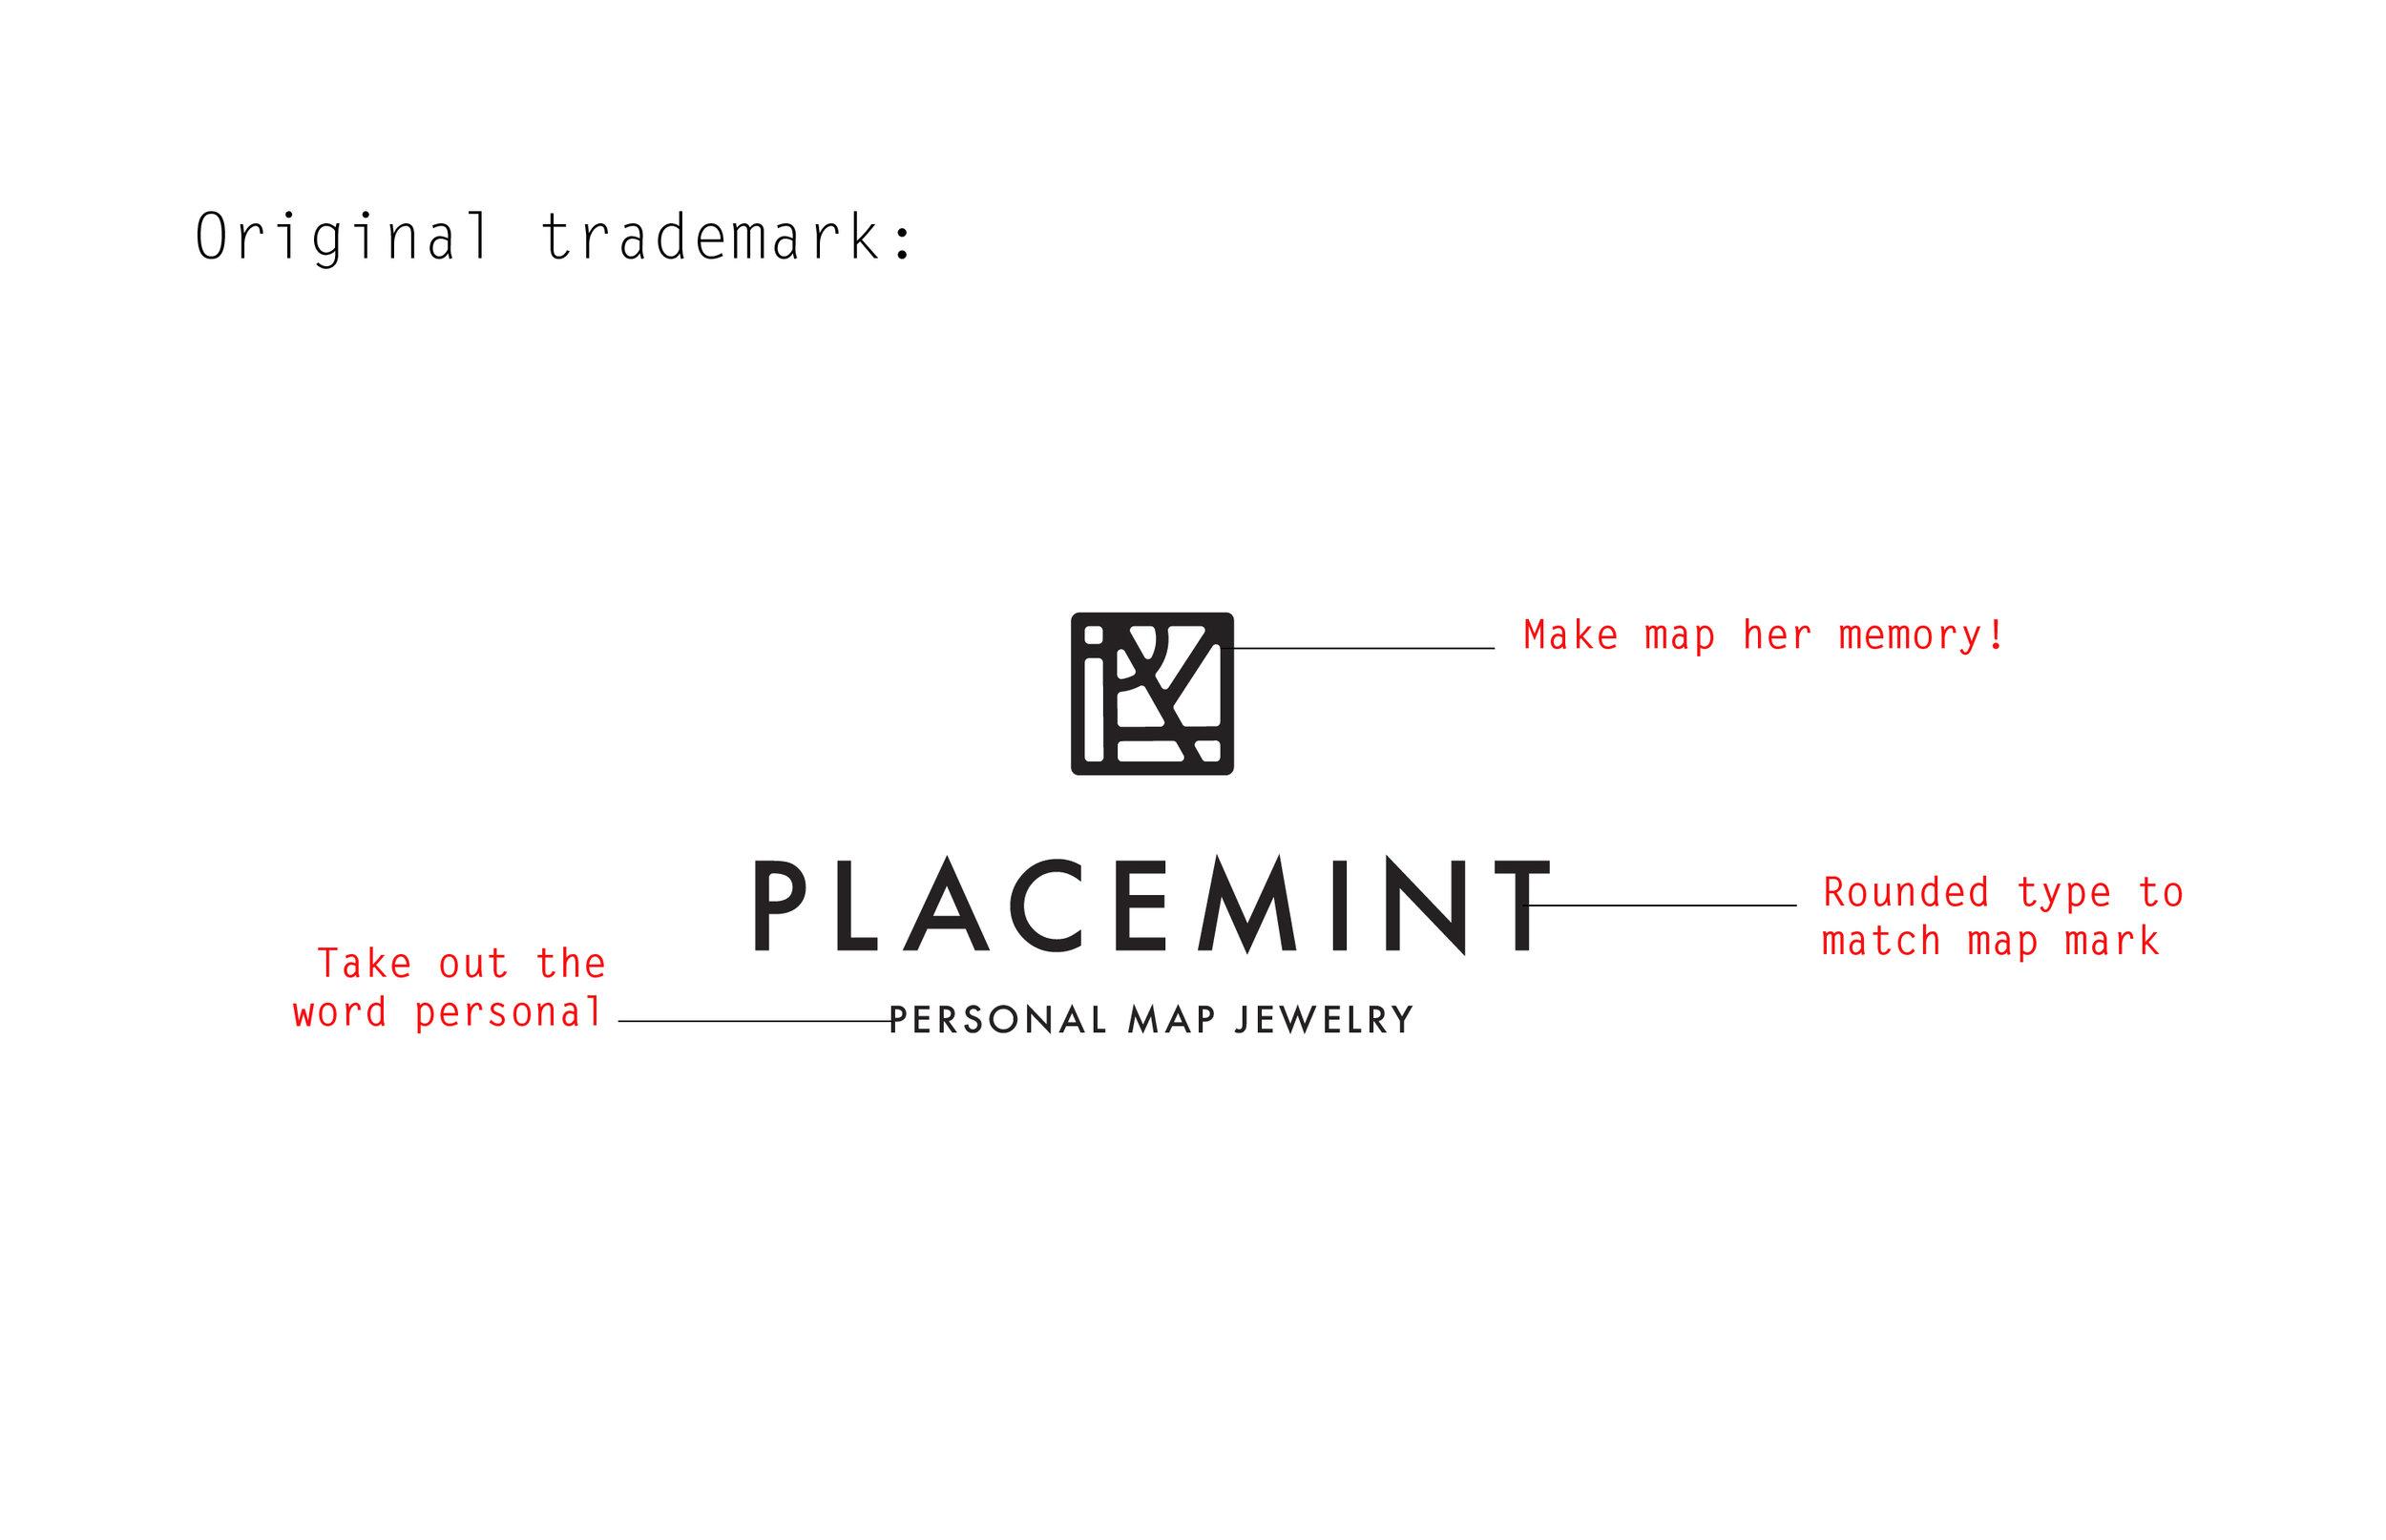 processplacemint-01.jpg